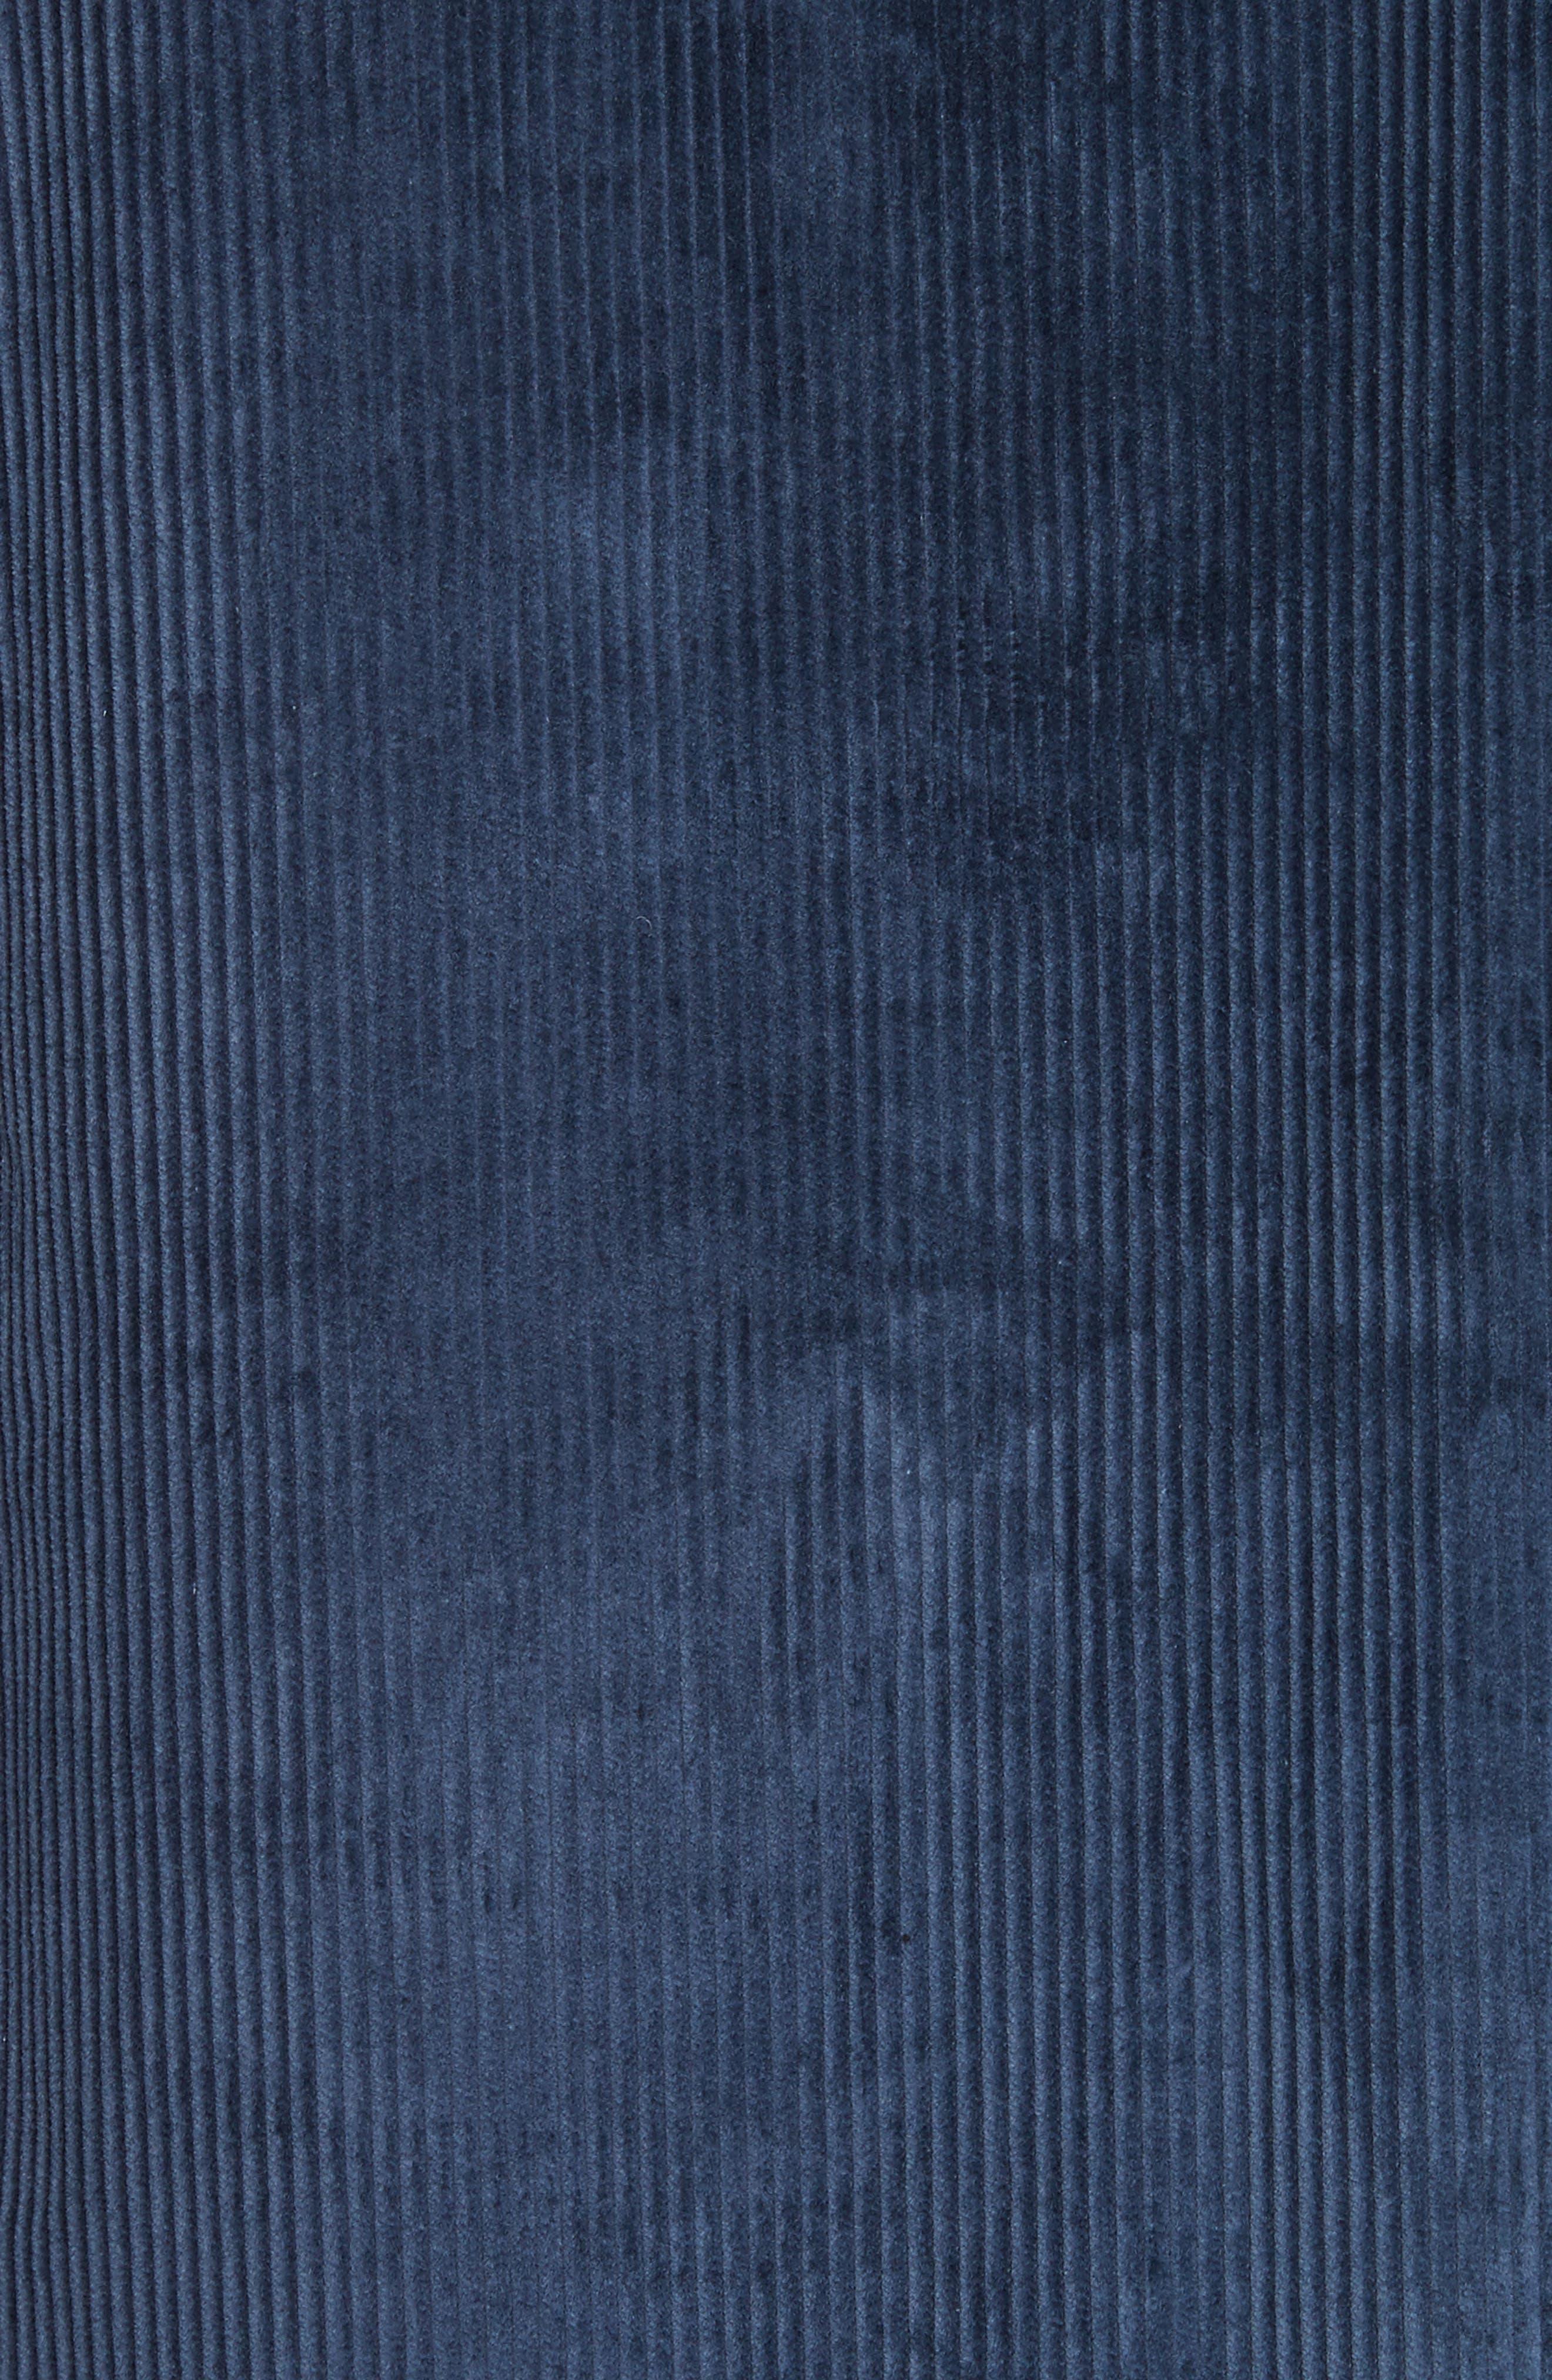 Hans Corduroy Shirt,                             Alternate thumbnail 2, color,                             405